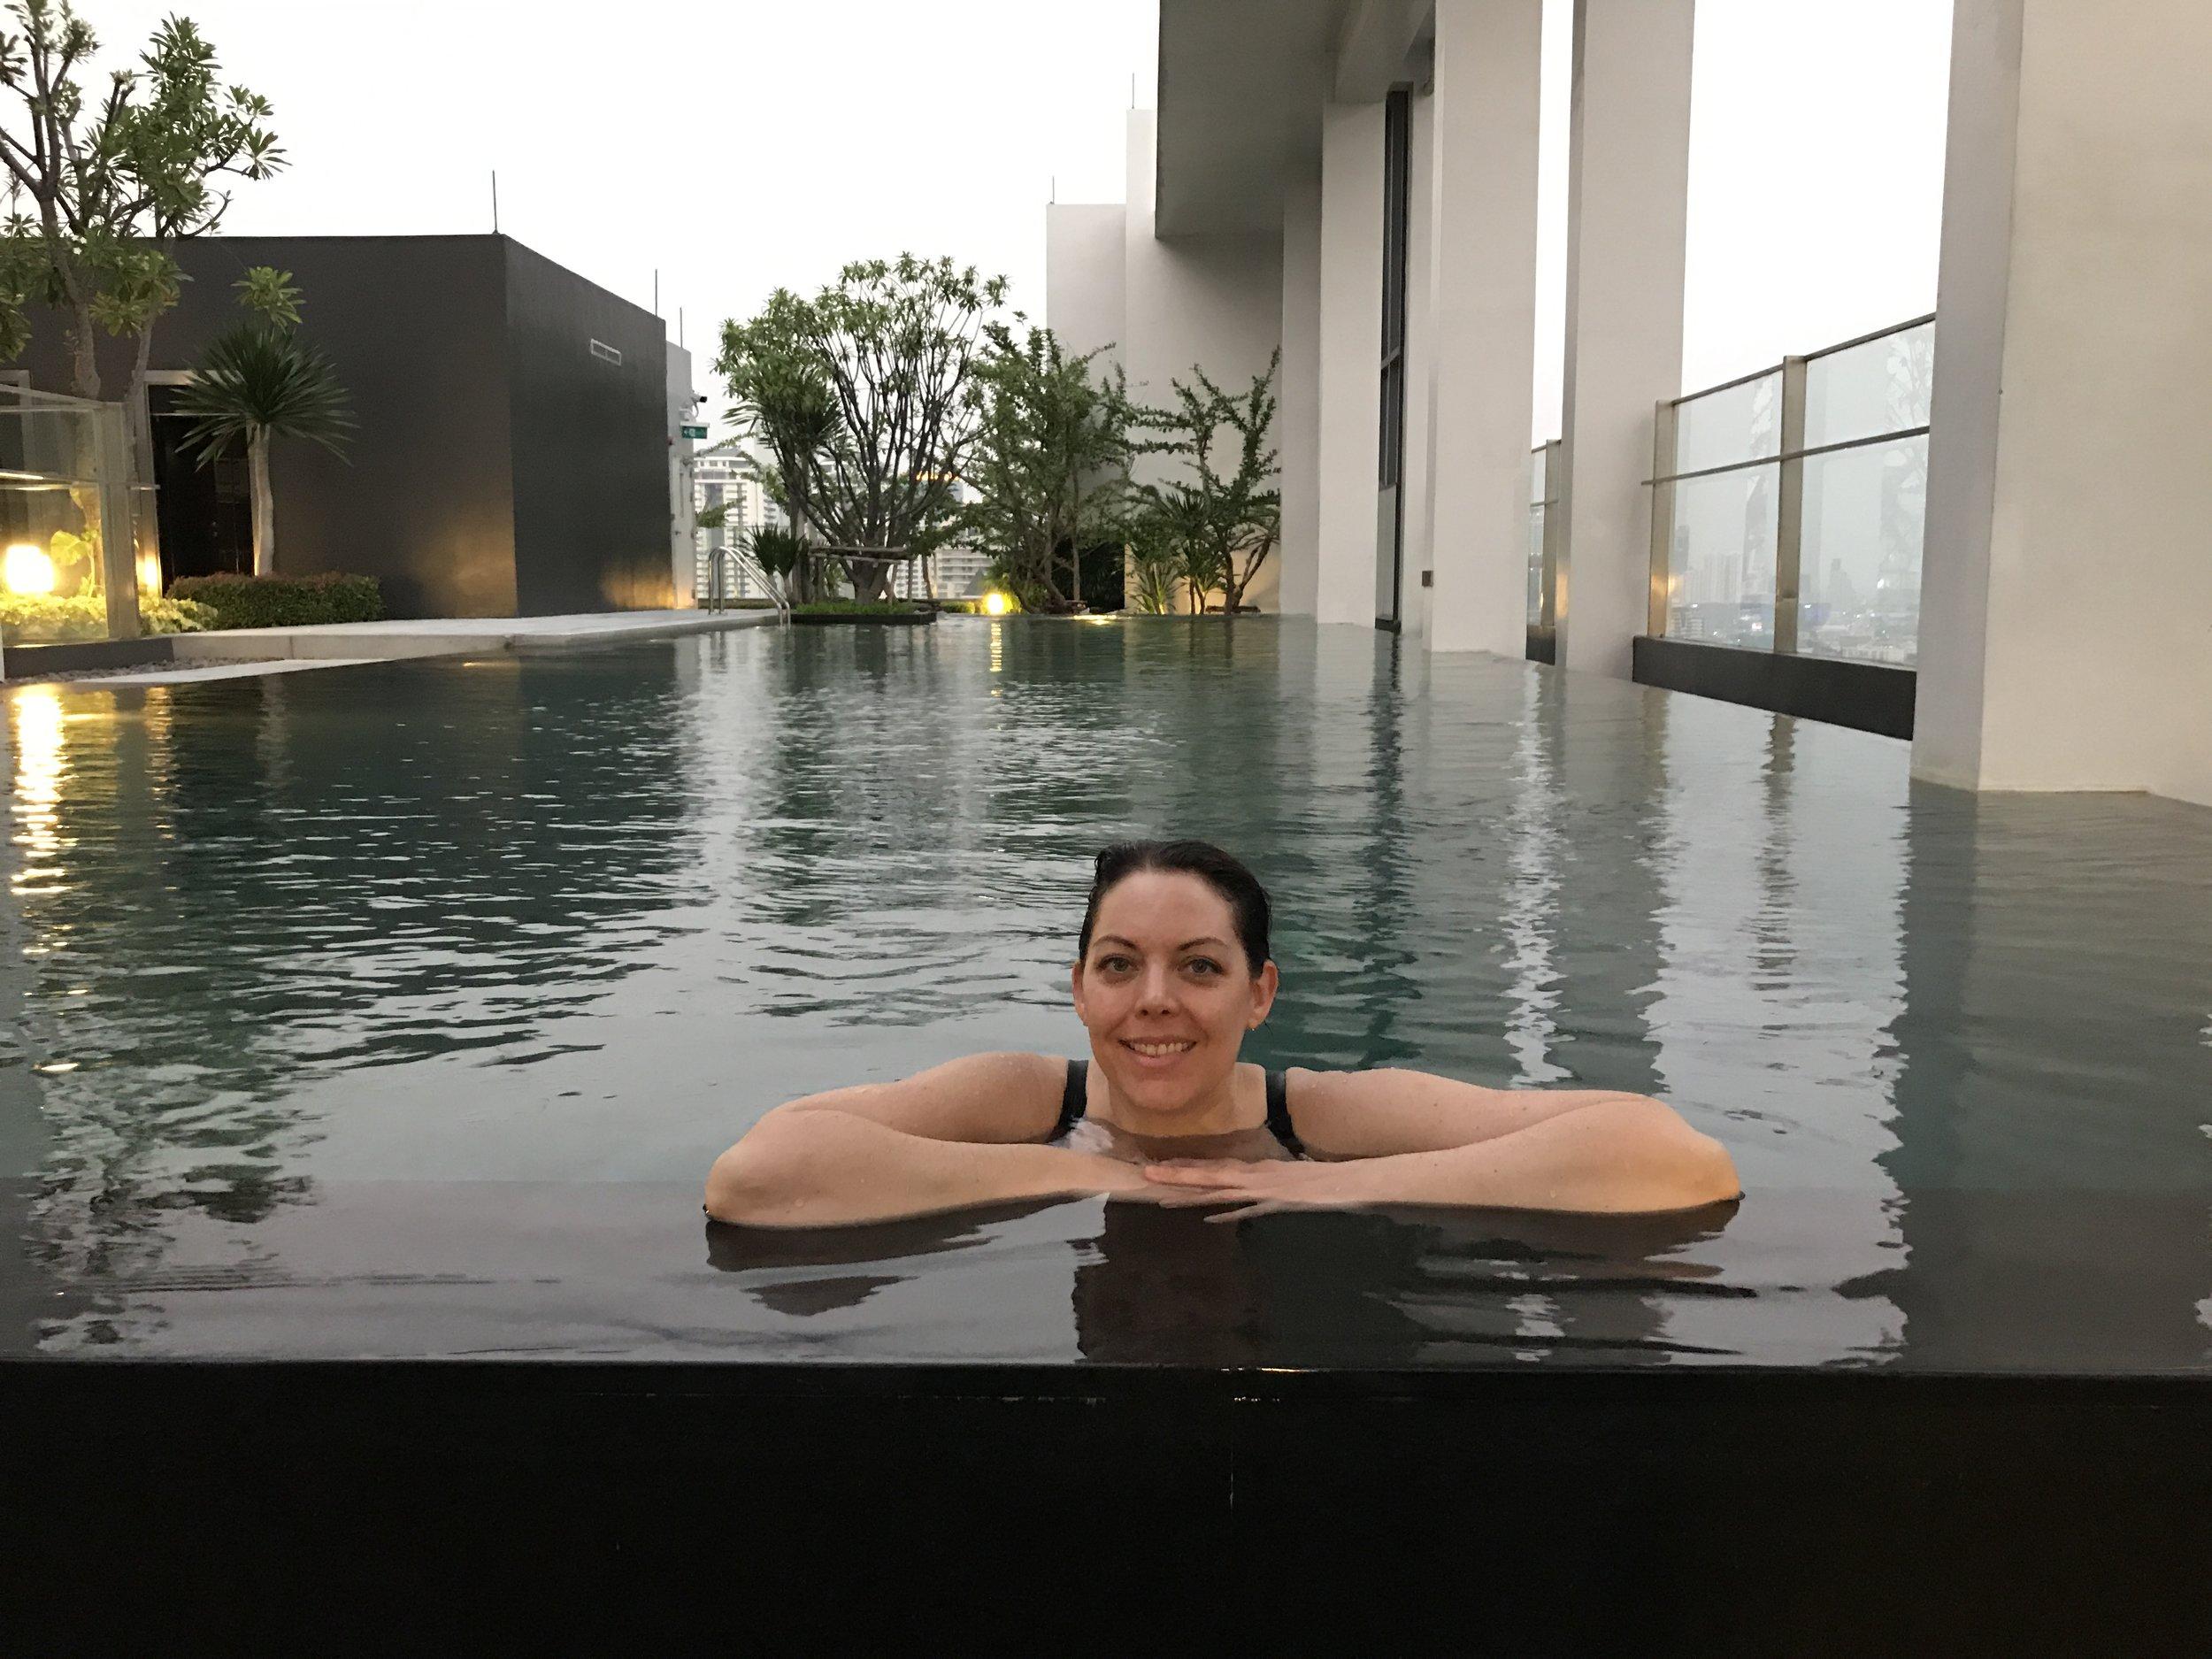 Rooftop pool at an Airbnb in Bangkok, Thailand